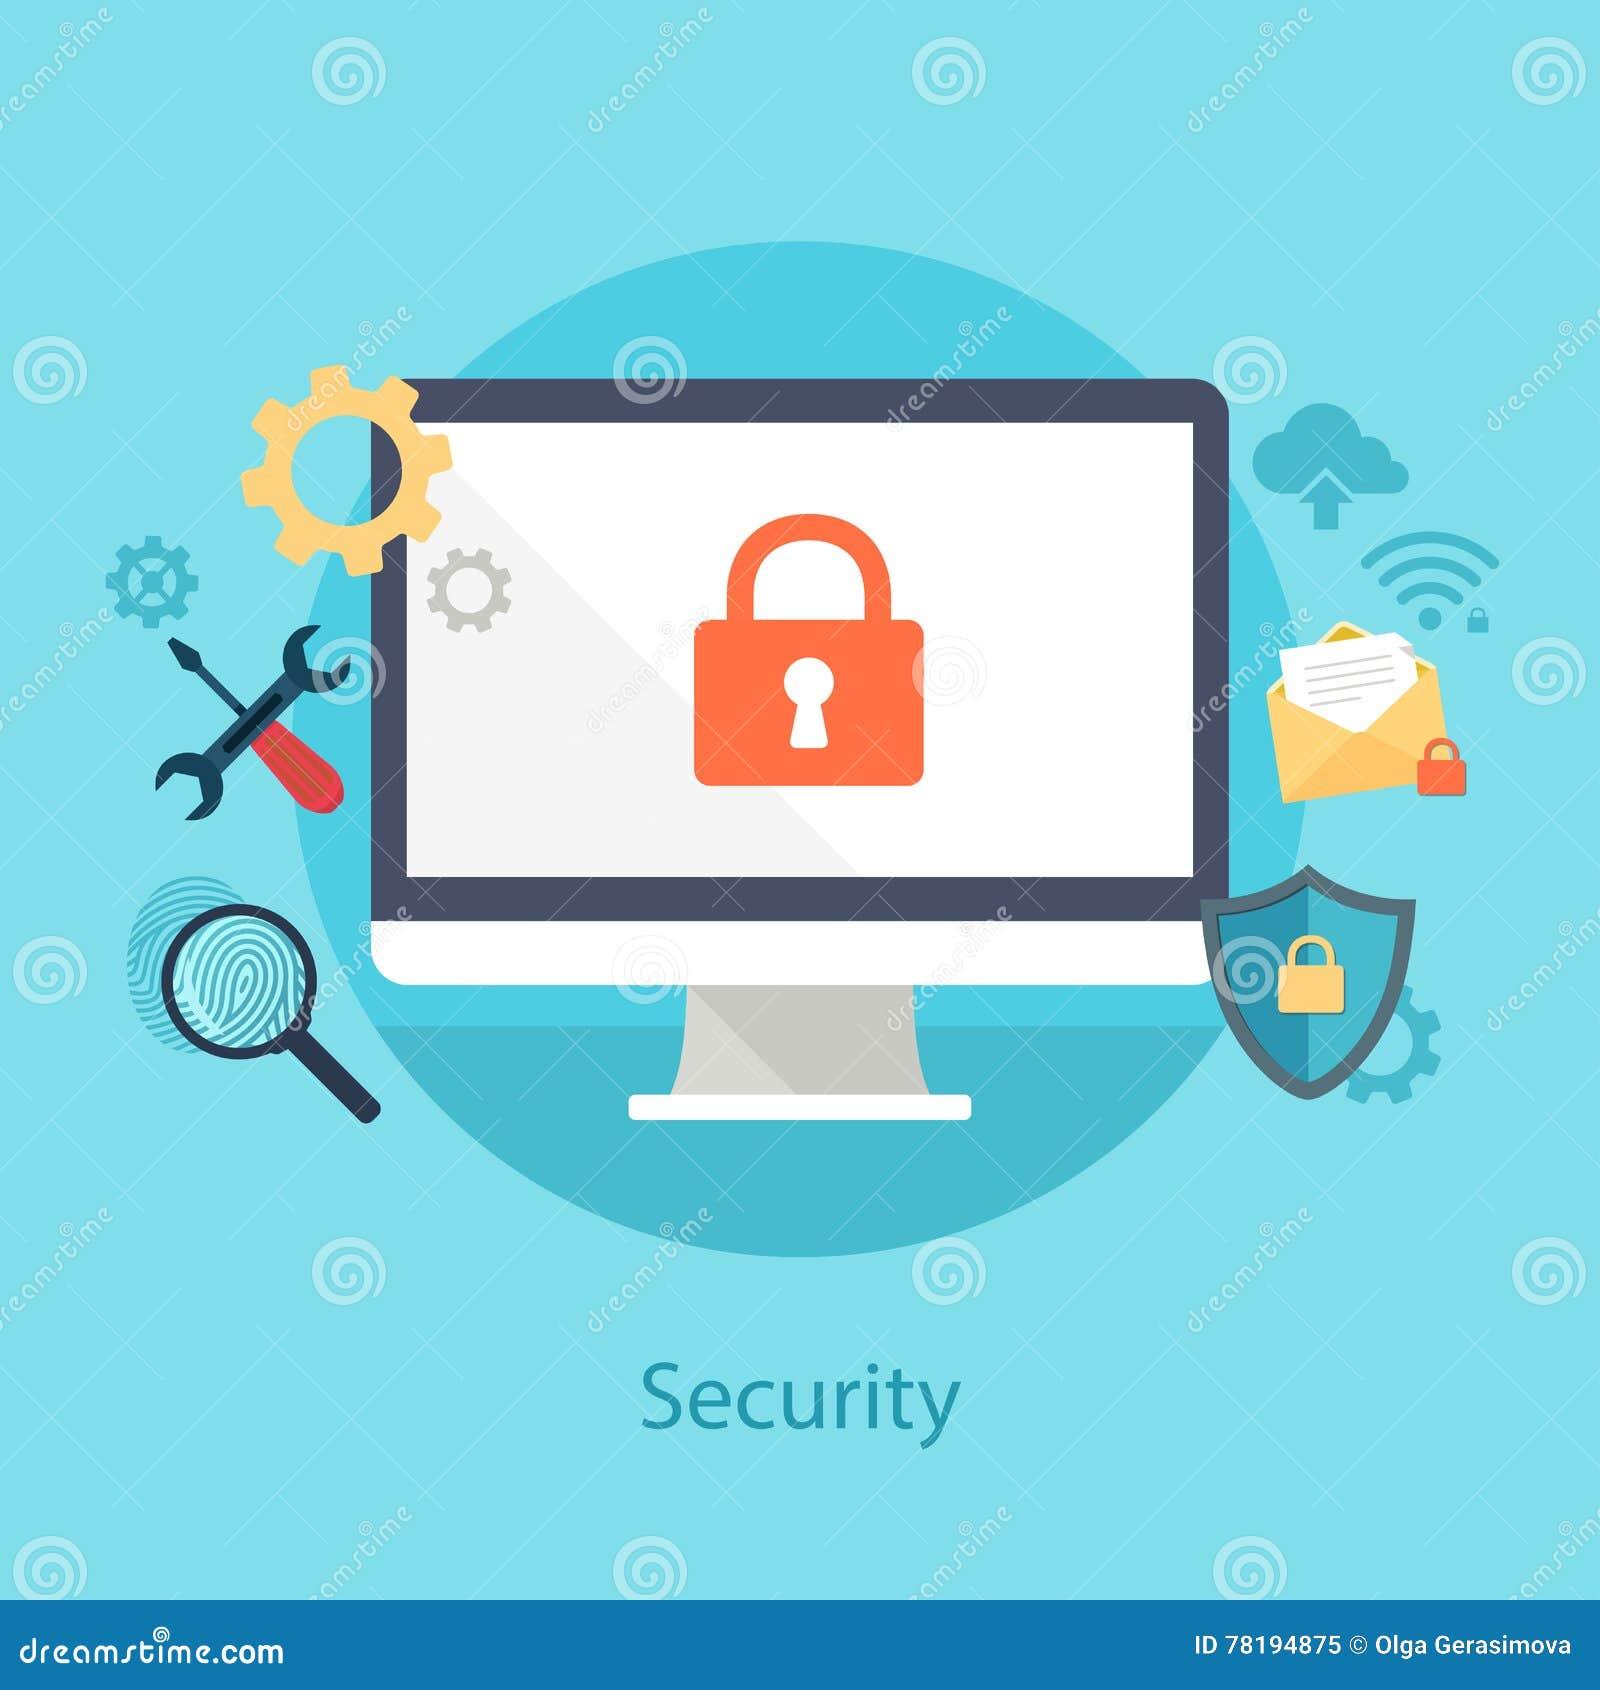 Security System Design Stock Illustration | CartoonDealer ...